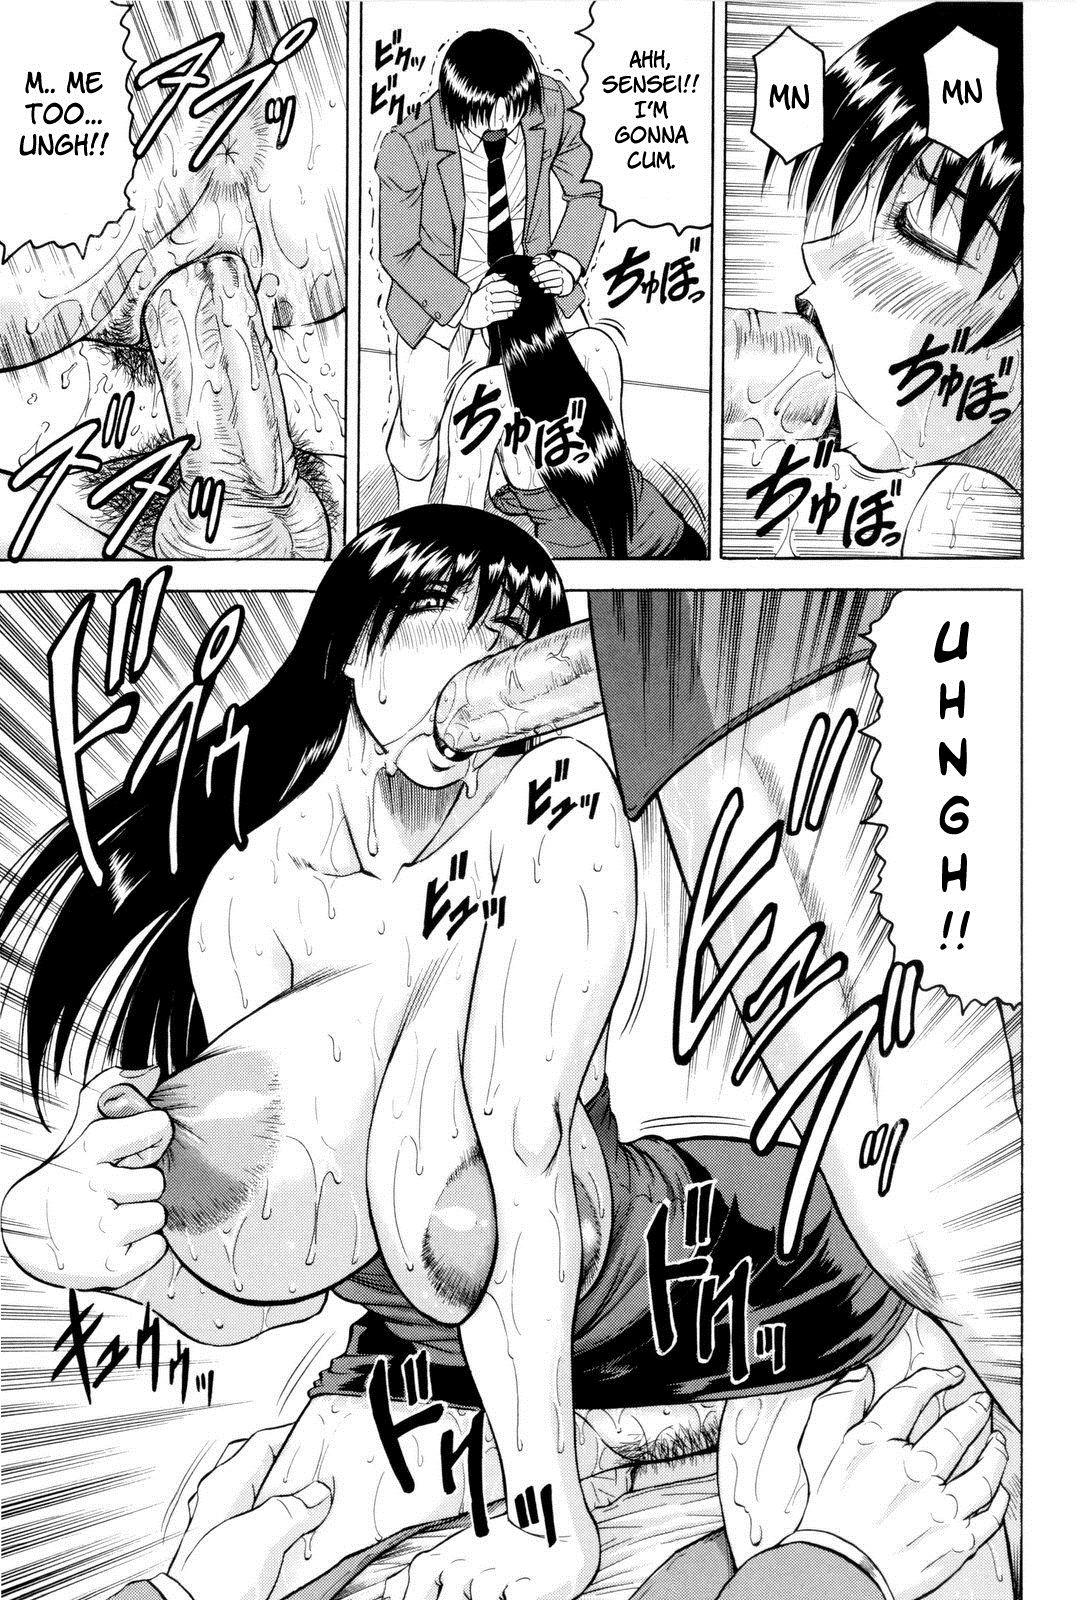 Sensei ni Dashitee! - It ejaculates in the teacher! 100